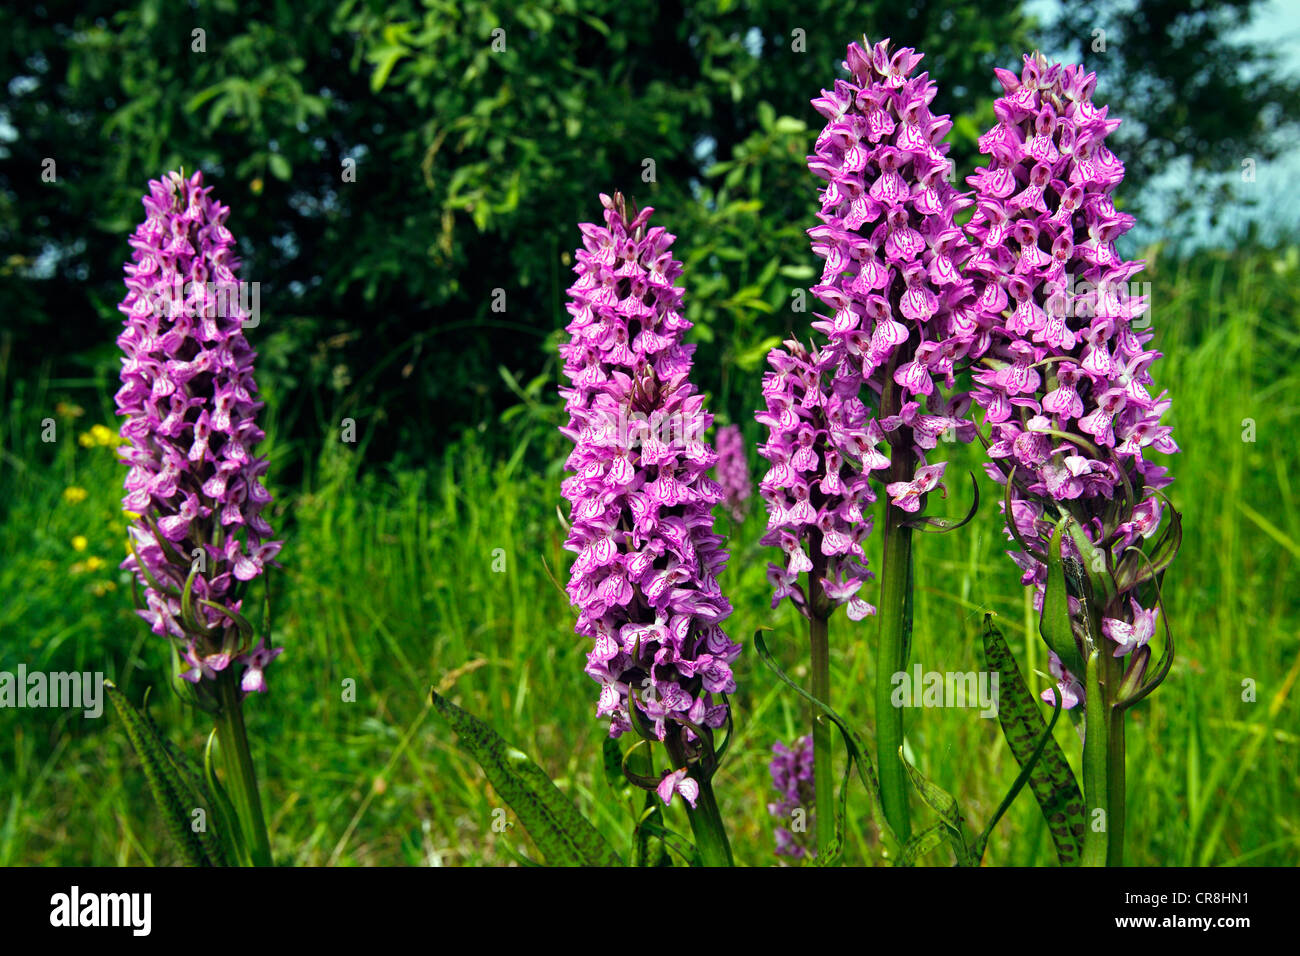 Flowering Southern Marsh Orchid or Leopard Marsh Orchid (Dactylorhiza praetermissa var. junialis) - Stock Image